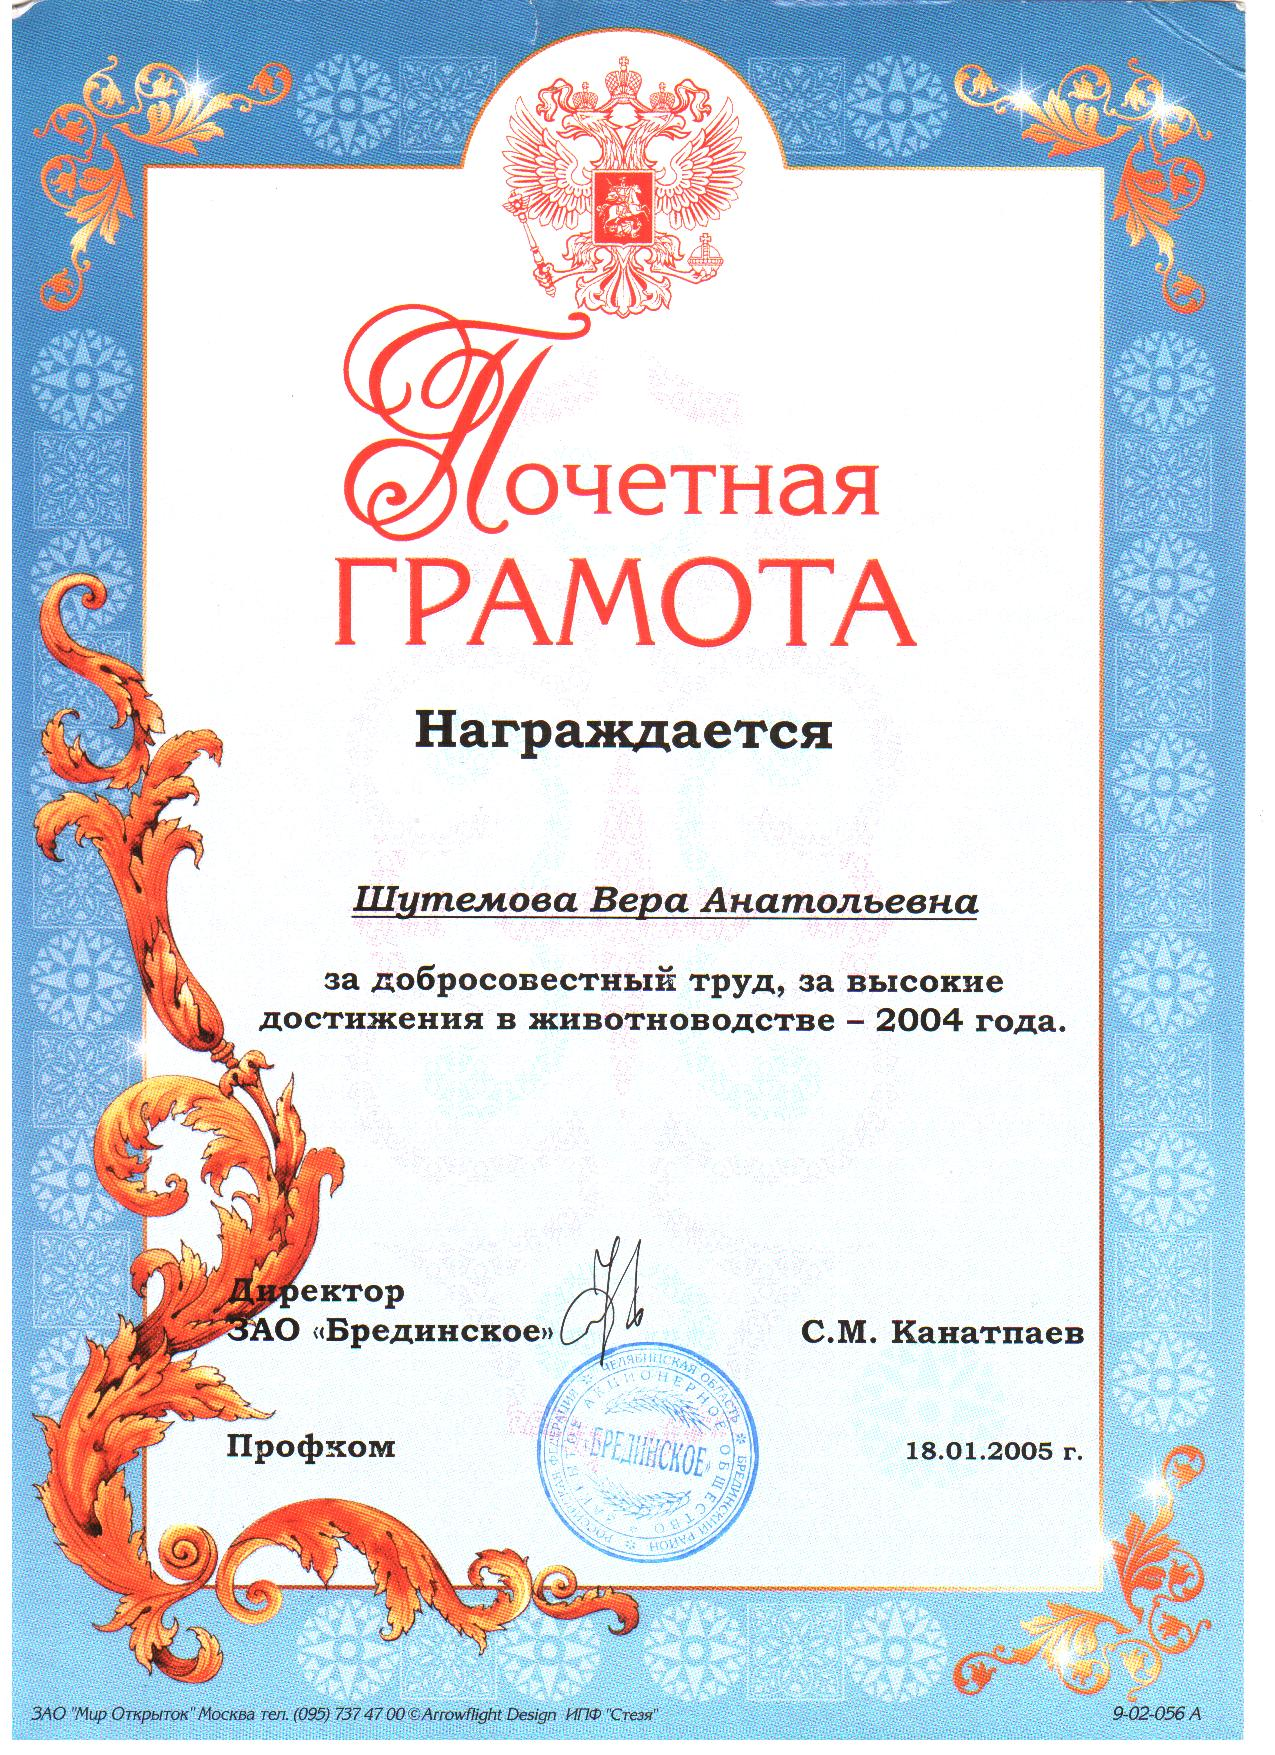 C:\Documents and Settings\Администратор\Рабочий стол\Шутёмова приложение\Изображение 016.jpg